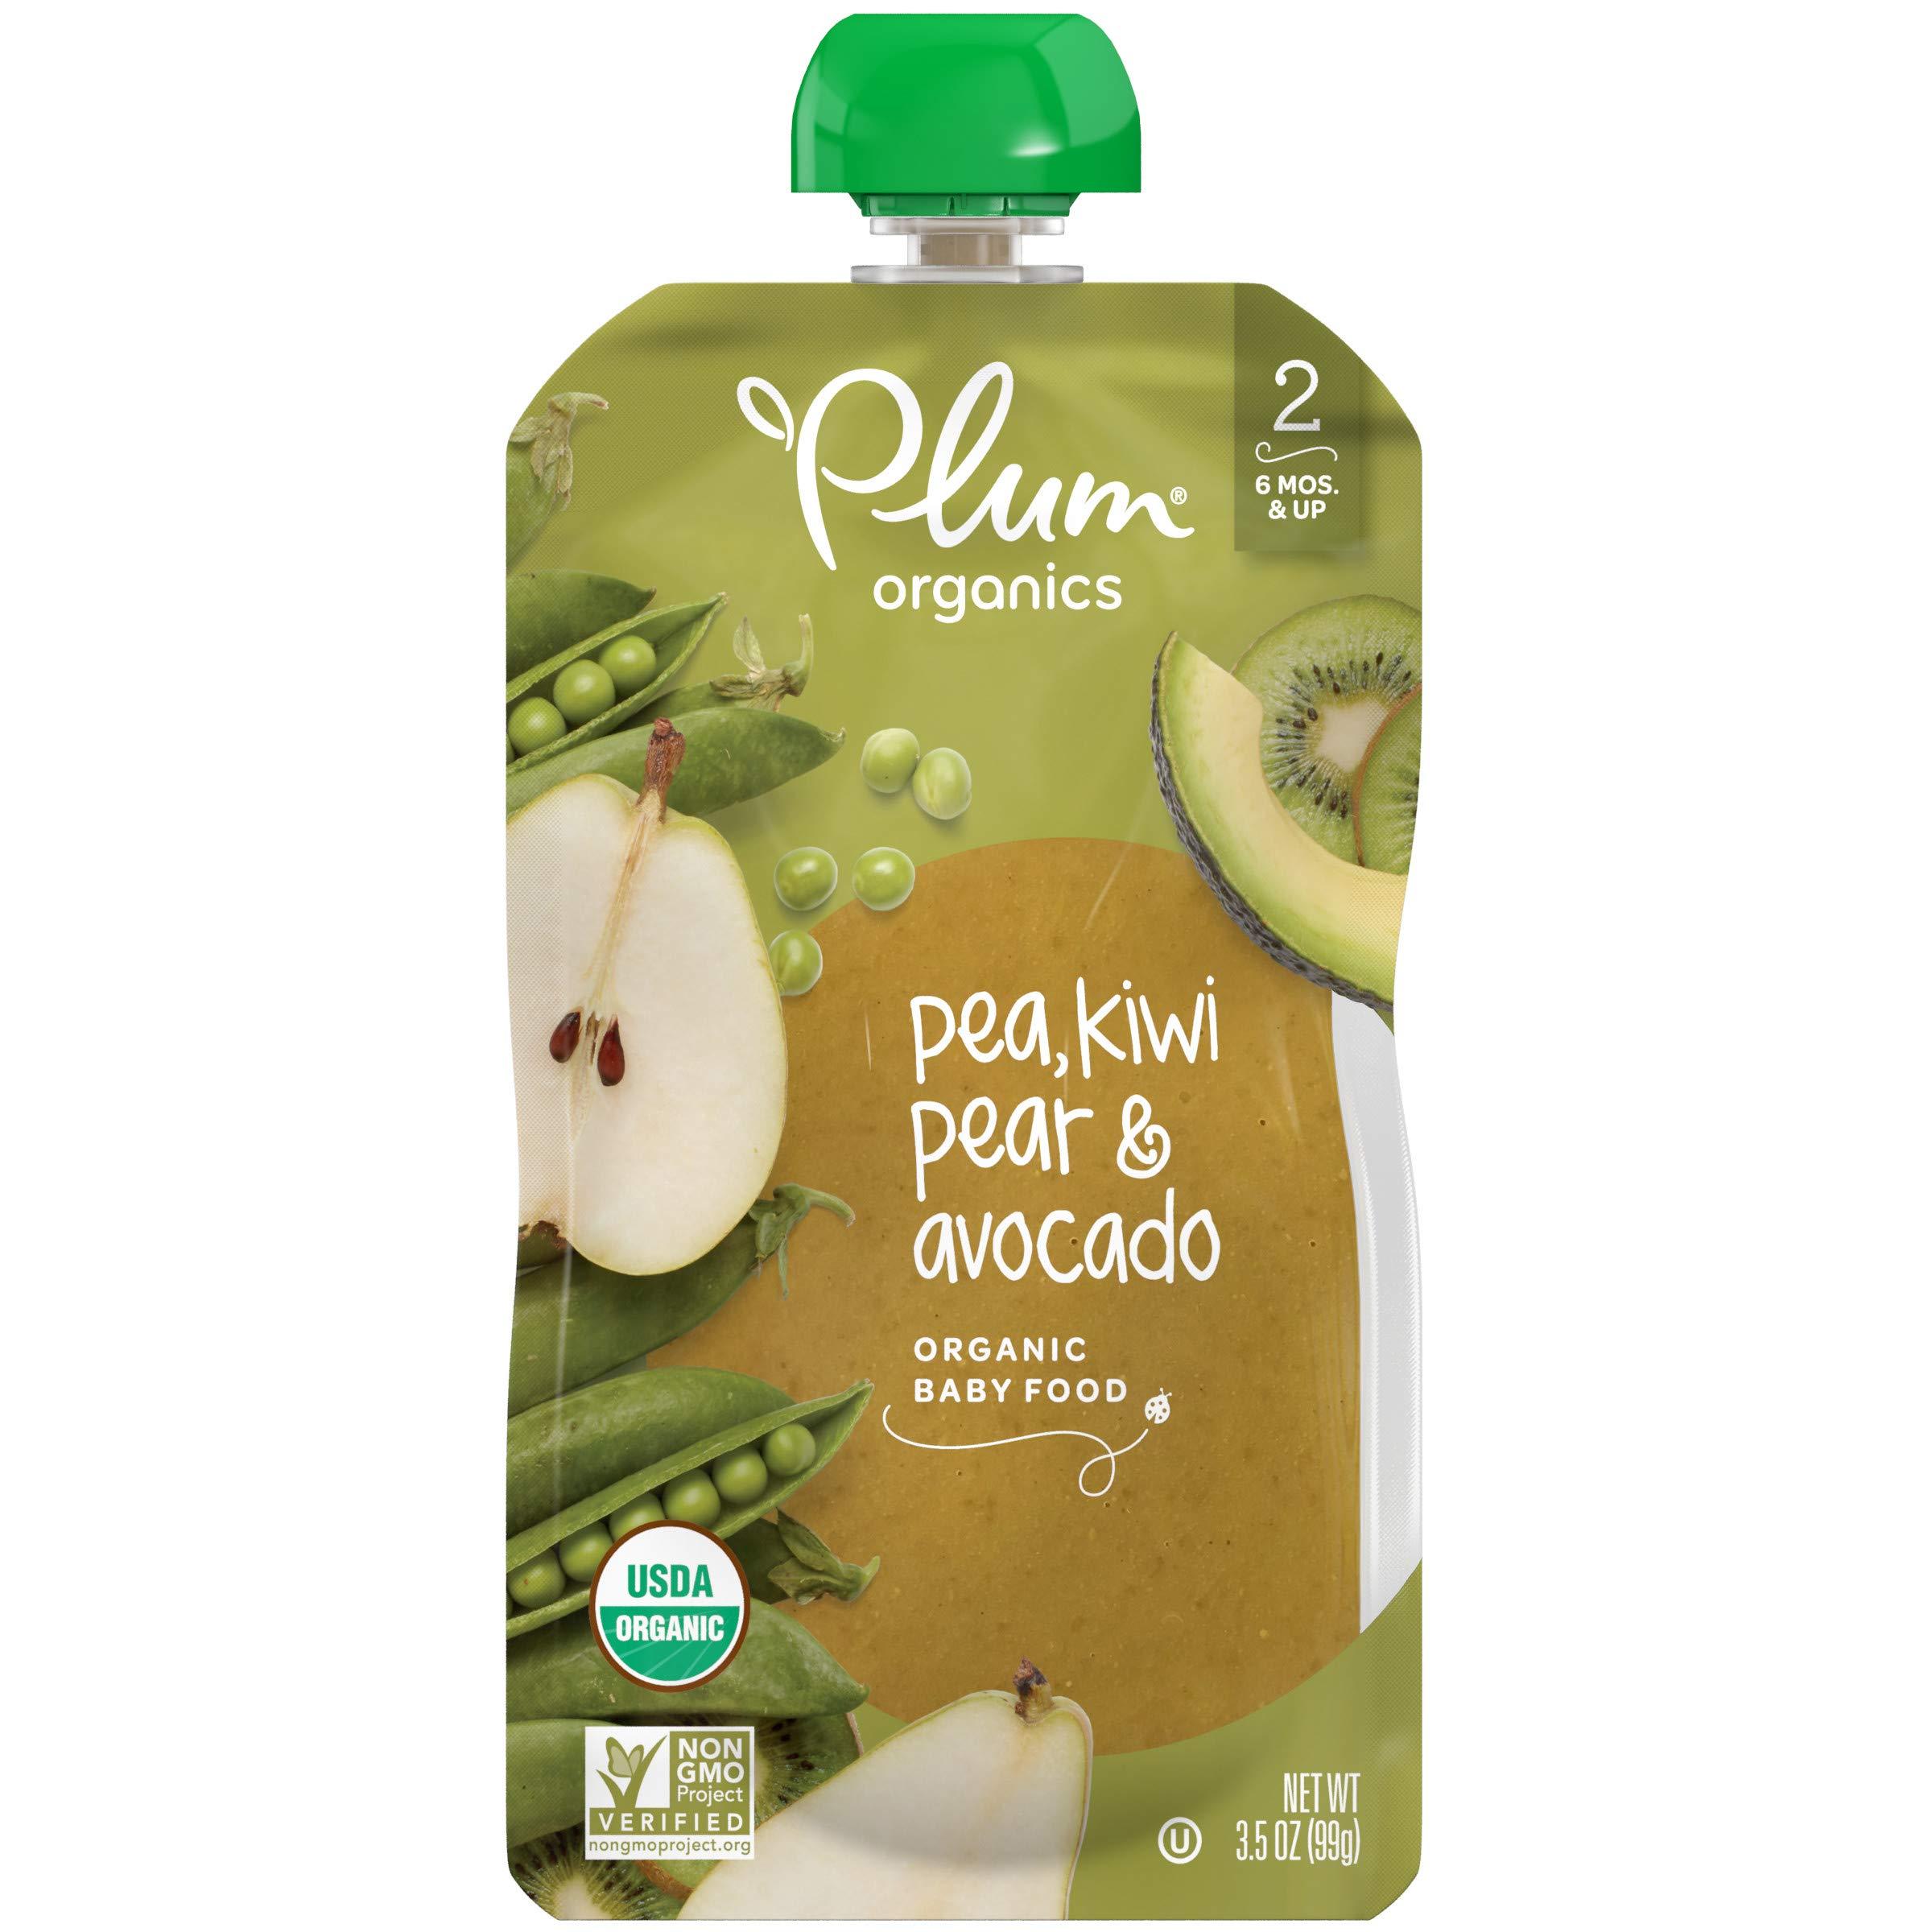 Plum Organics Stage 2, Organic Baby Food, Pea, Kiwi, Pear & Avocado, 3.5 Oz Pouch (Pack of 6)